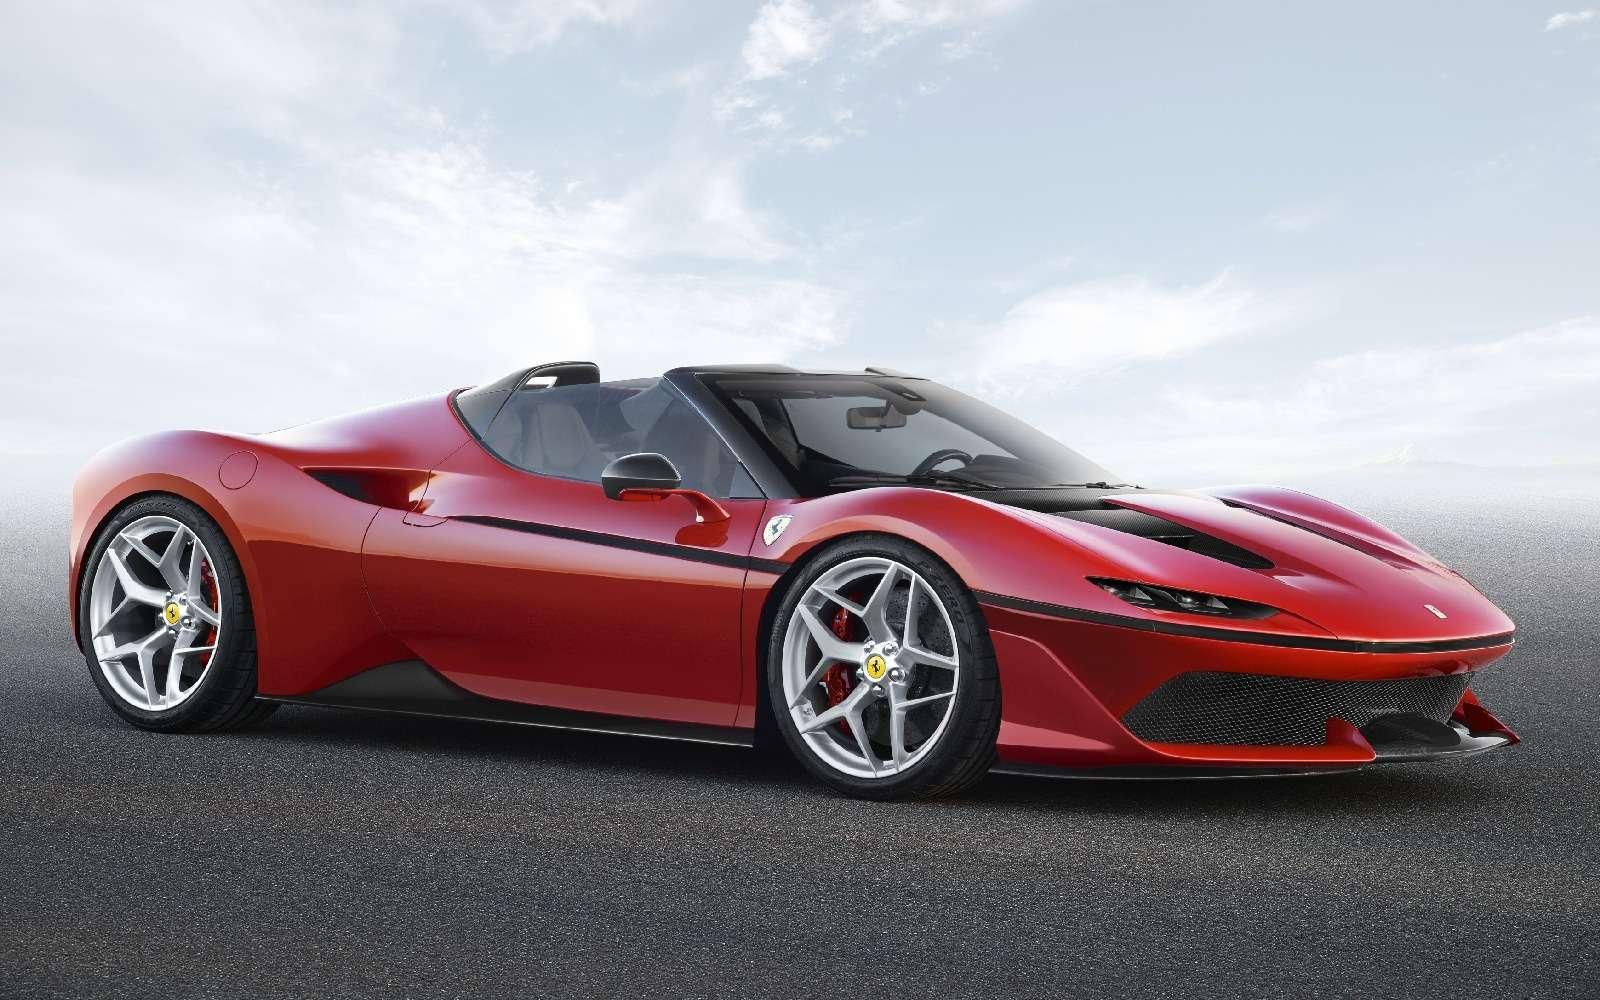 Япония вдохновляет: Ferrari представила юбилейную таргу J50— фото 677906